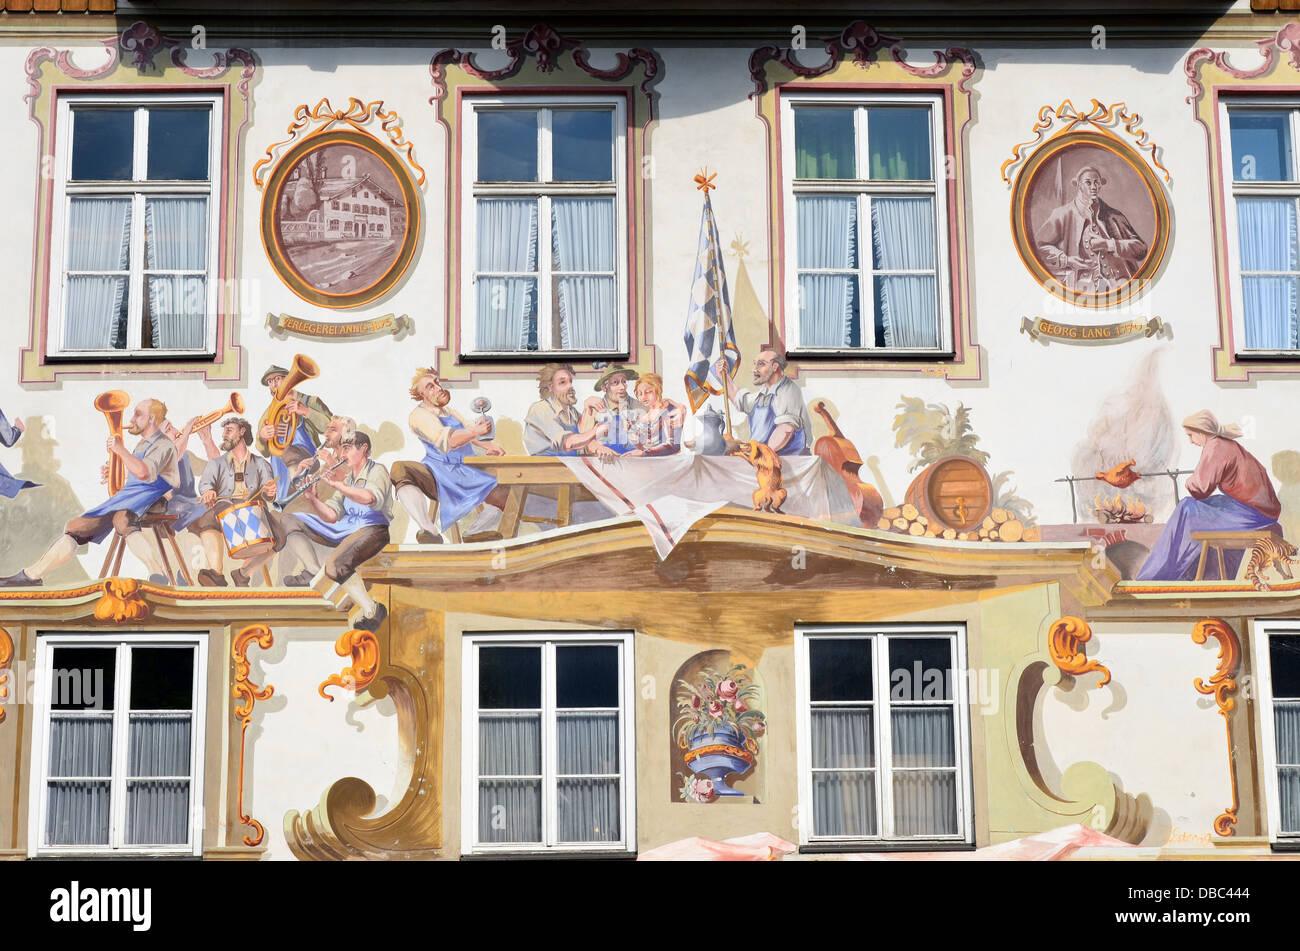 Trompe L Oeil Malerei oberammergau bavaria lüftlmalerei fresco frescoes architectural